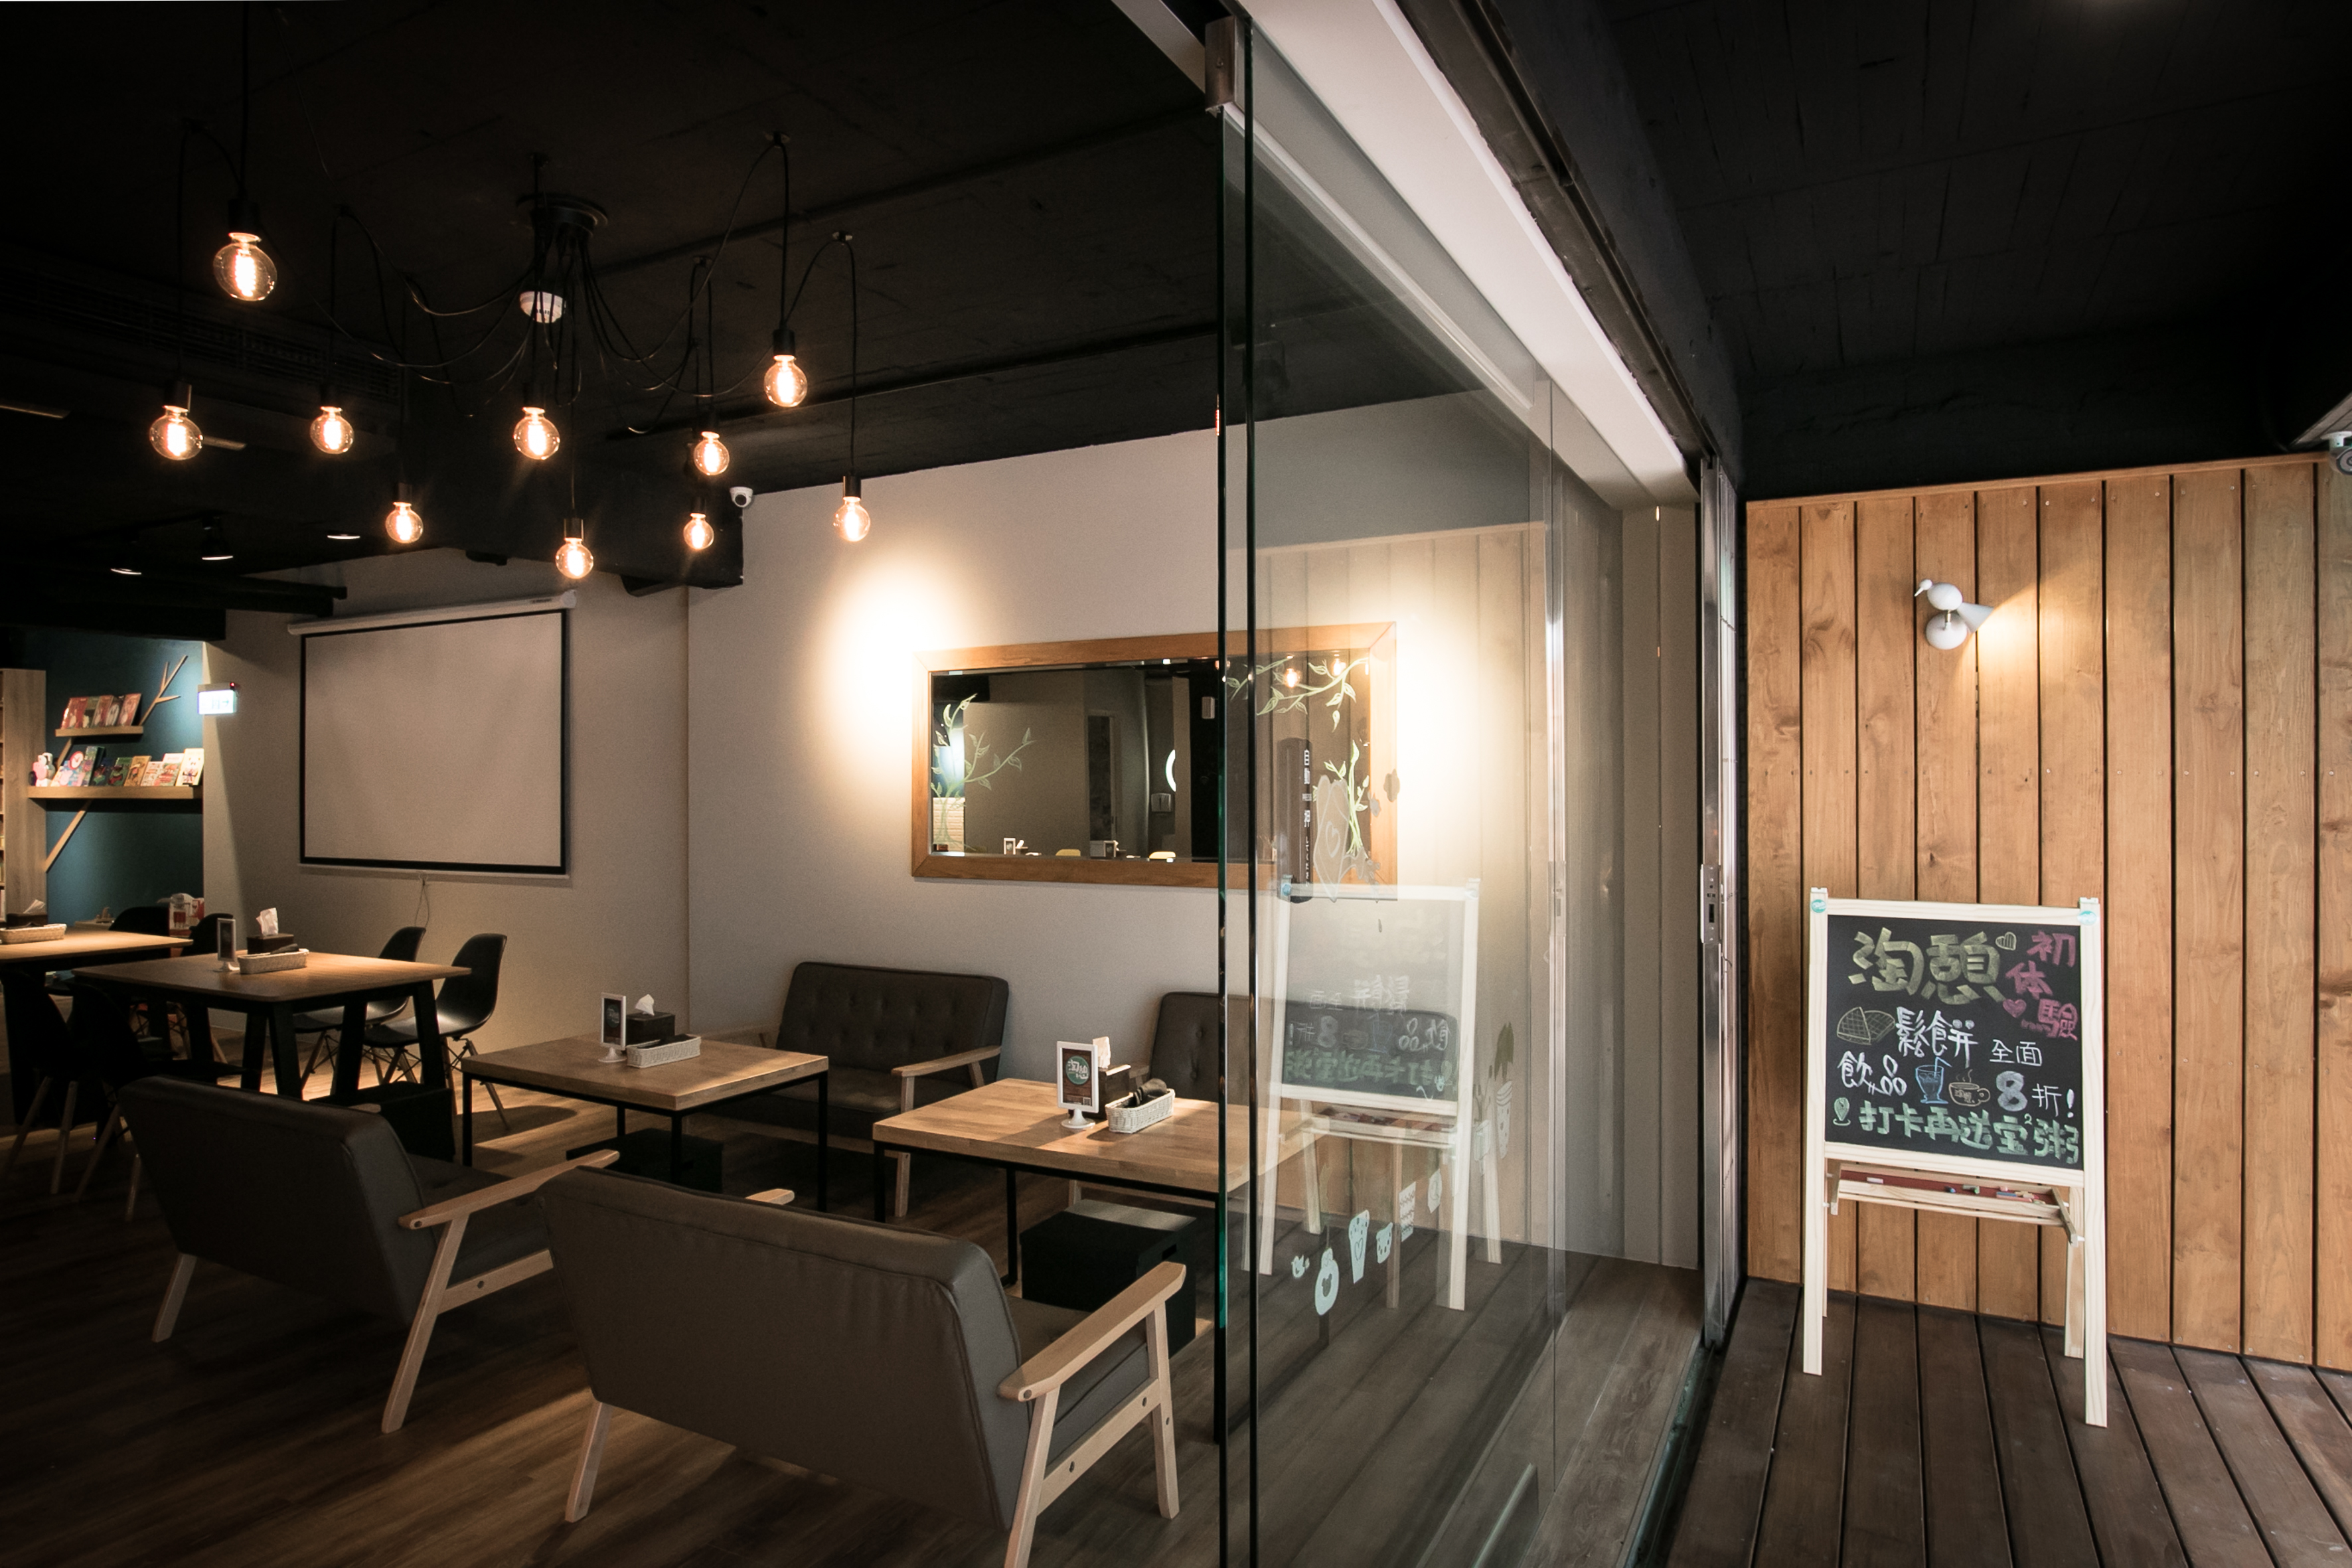 cozy-style 親子餐廳設計 (11)